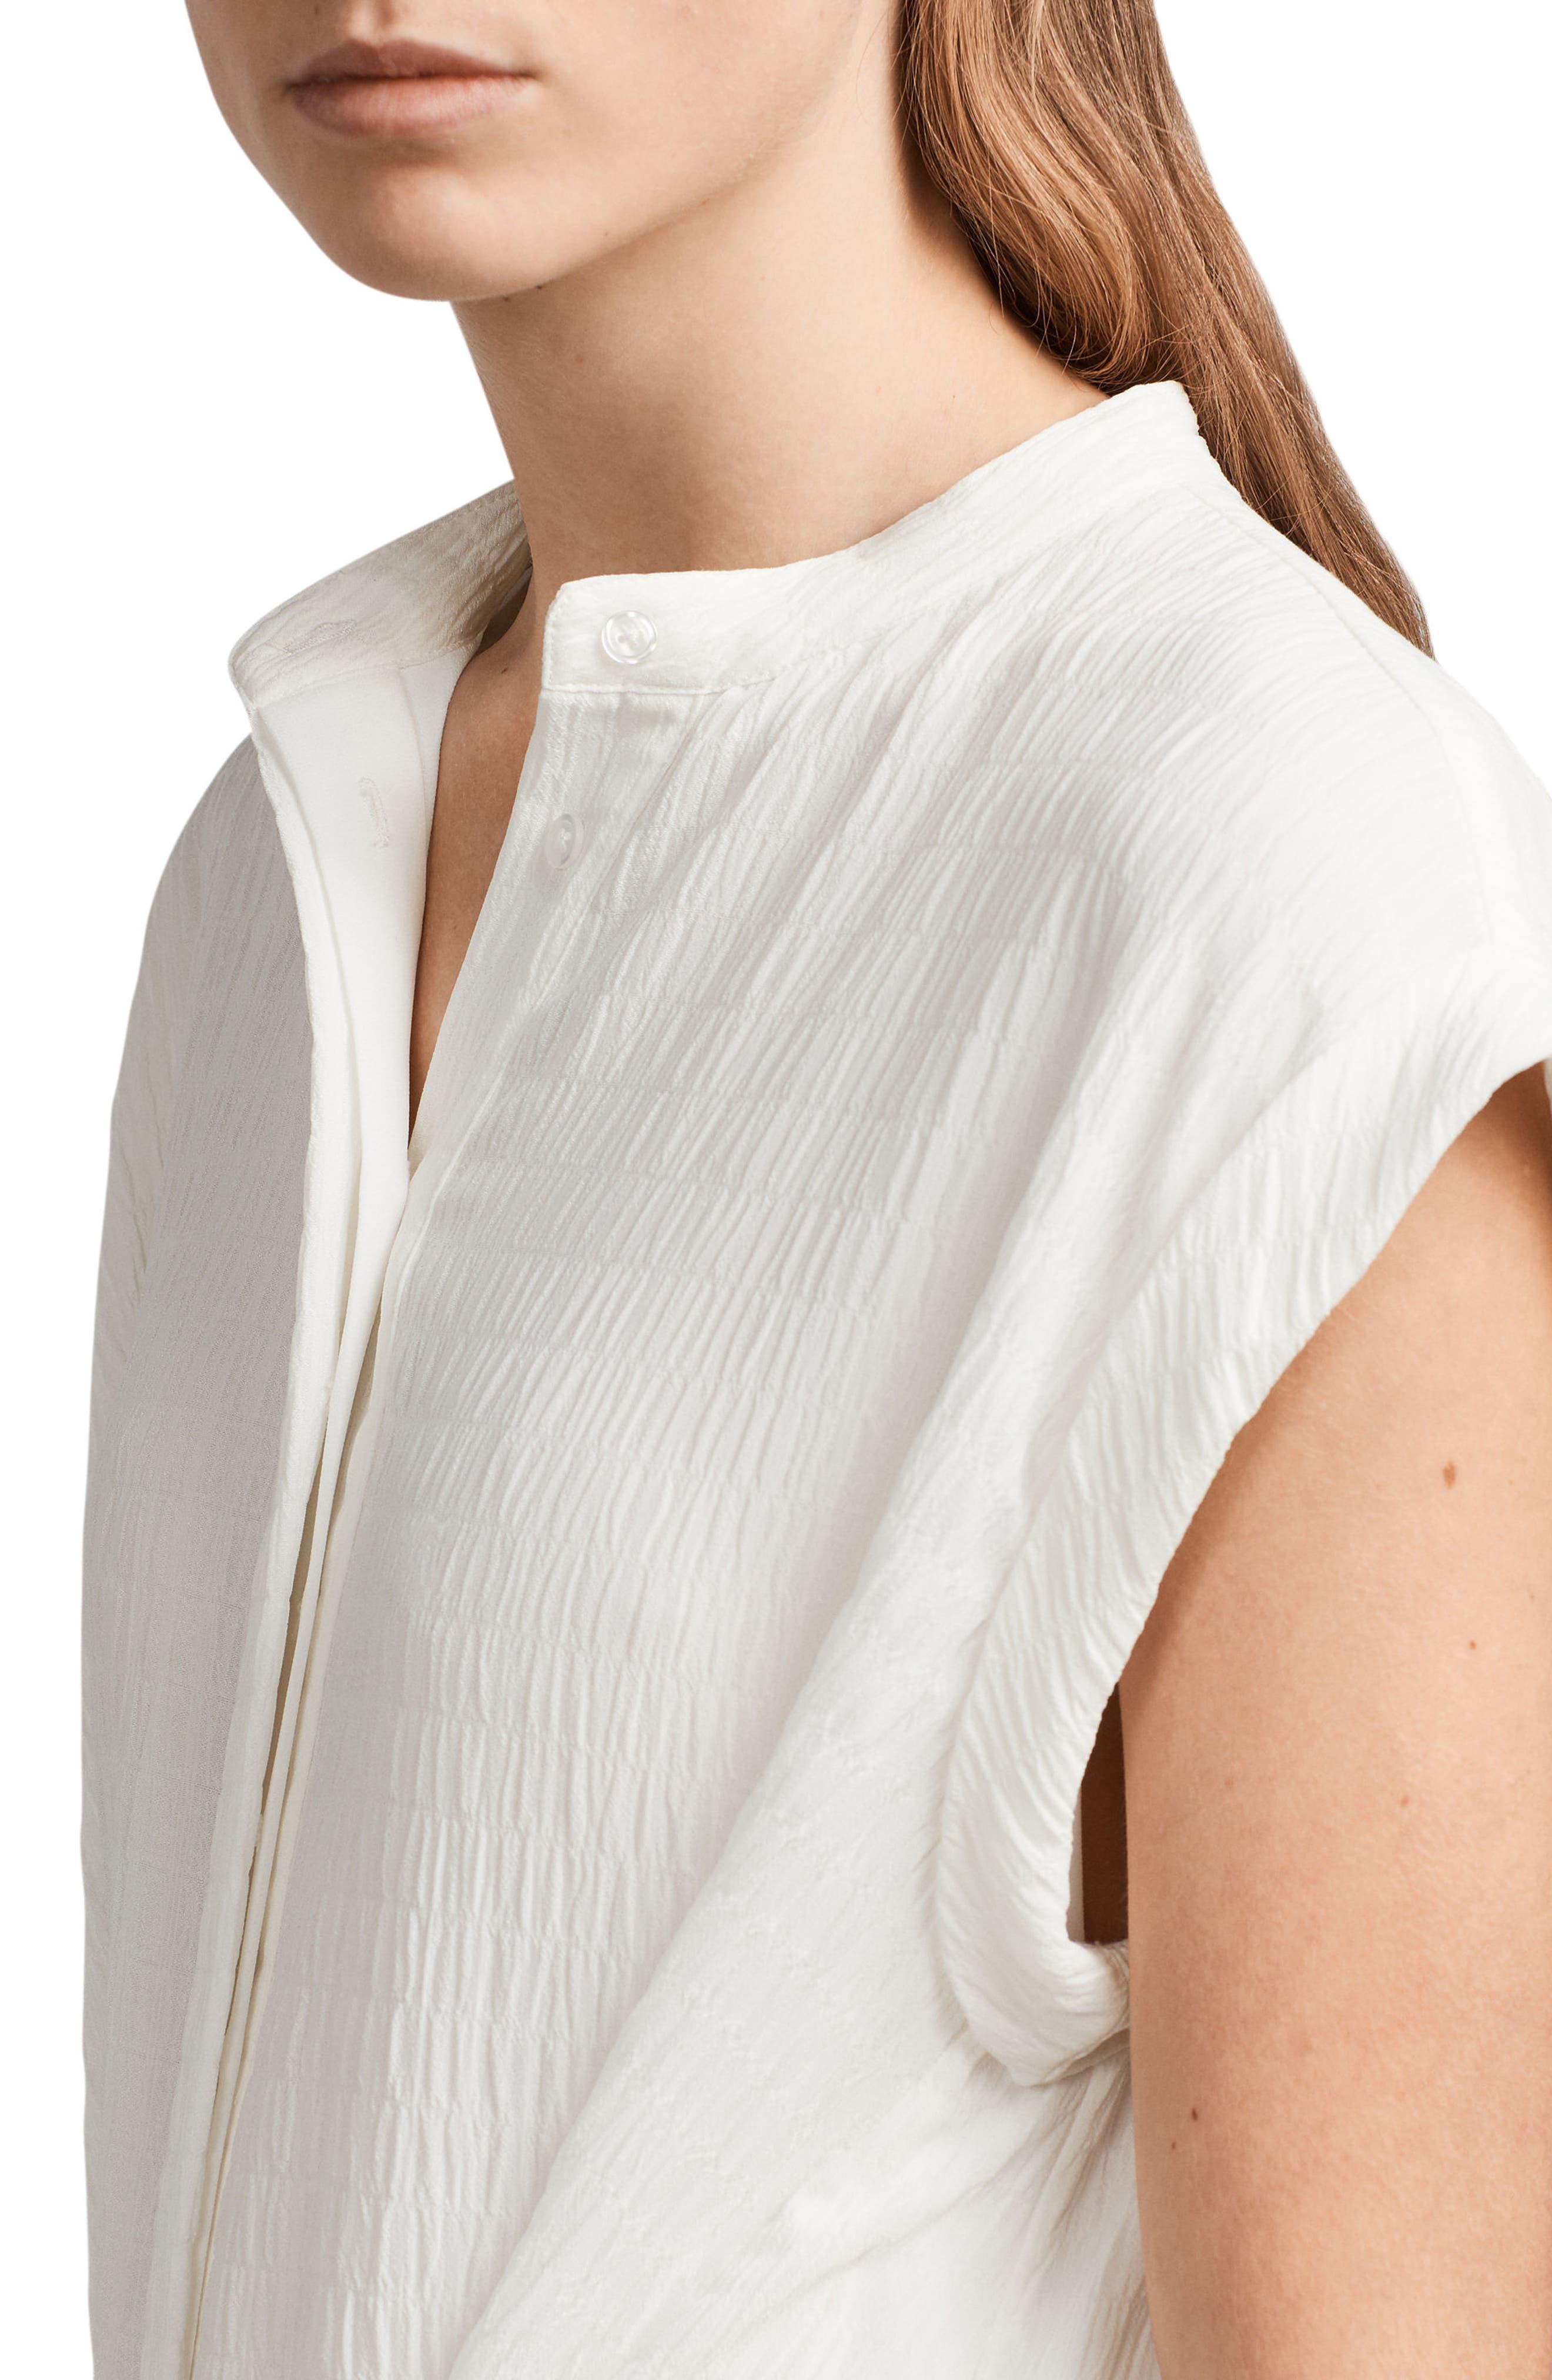 Meda Textured Shirtdress,                             Alternate thumbnail 4, color,                             Chalk White